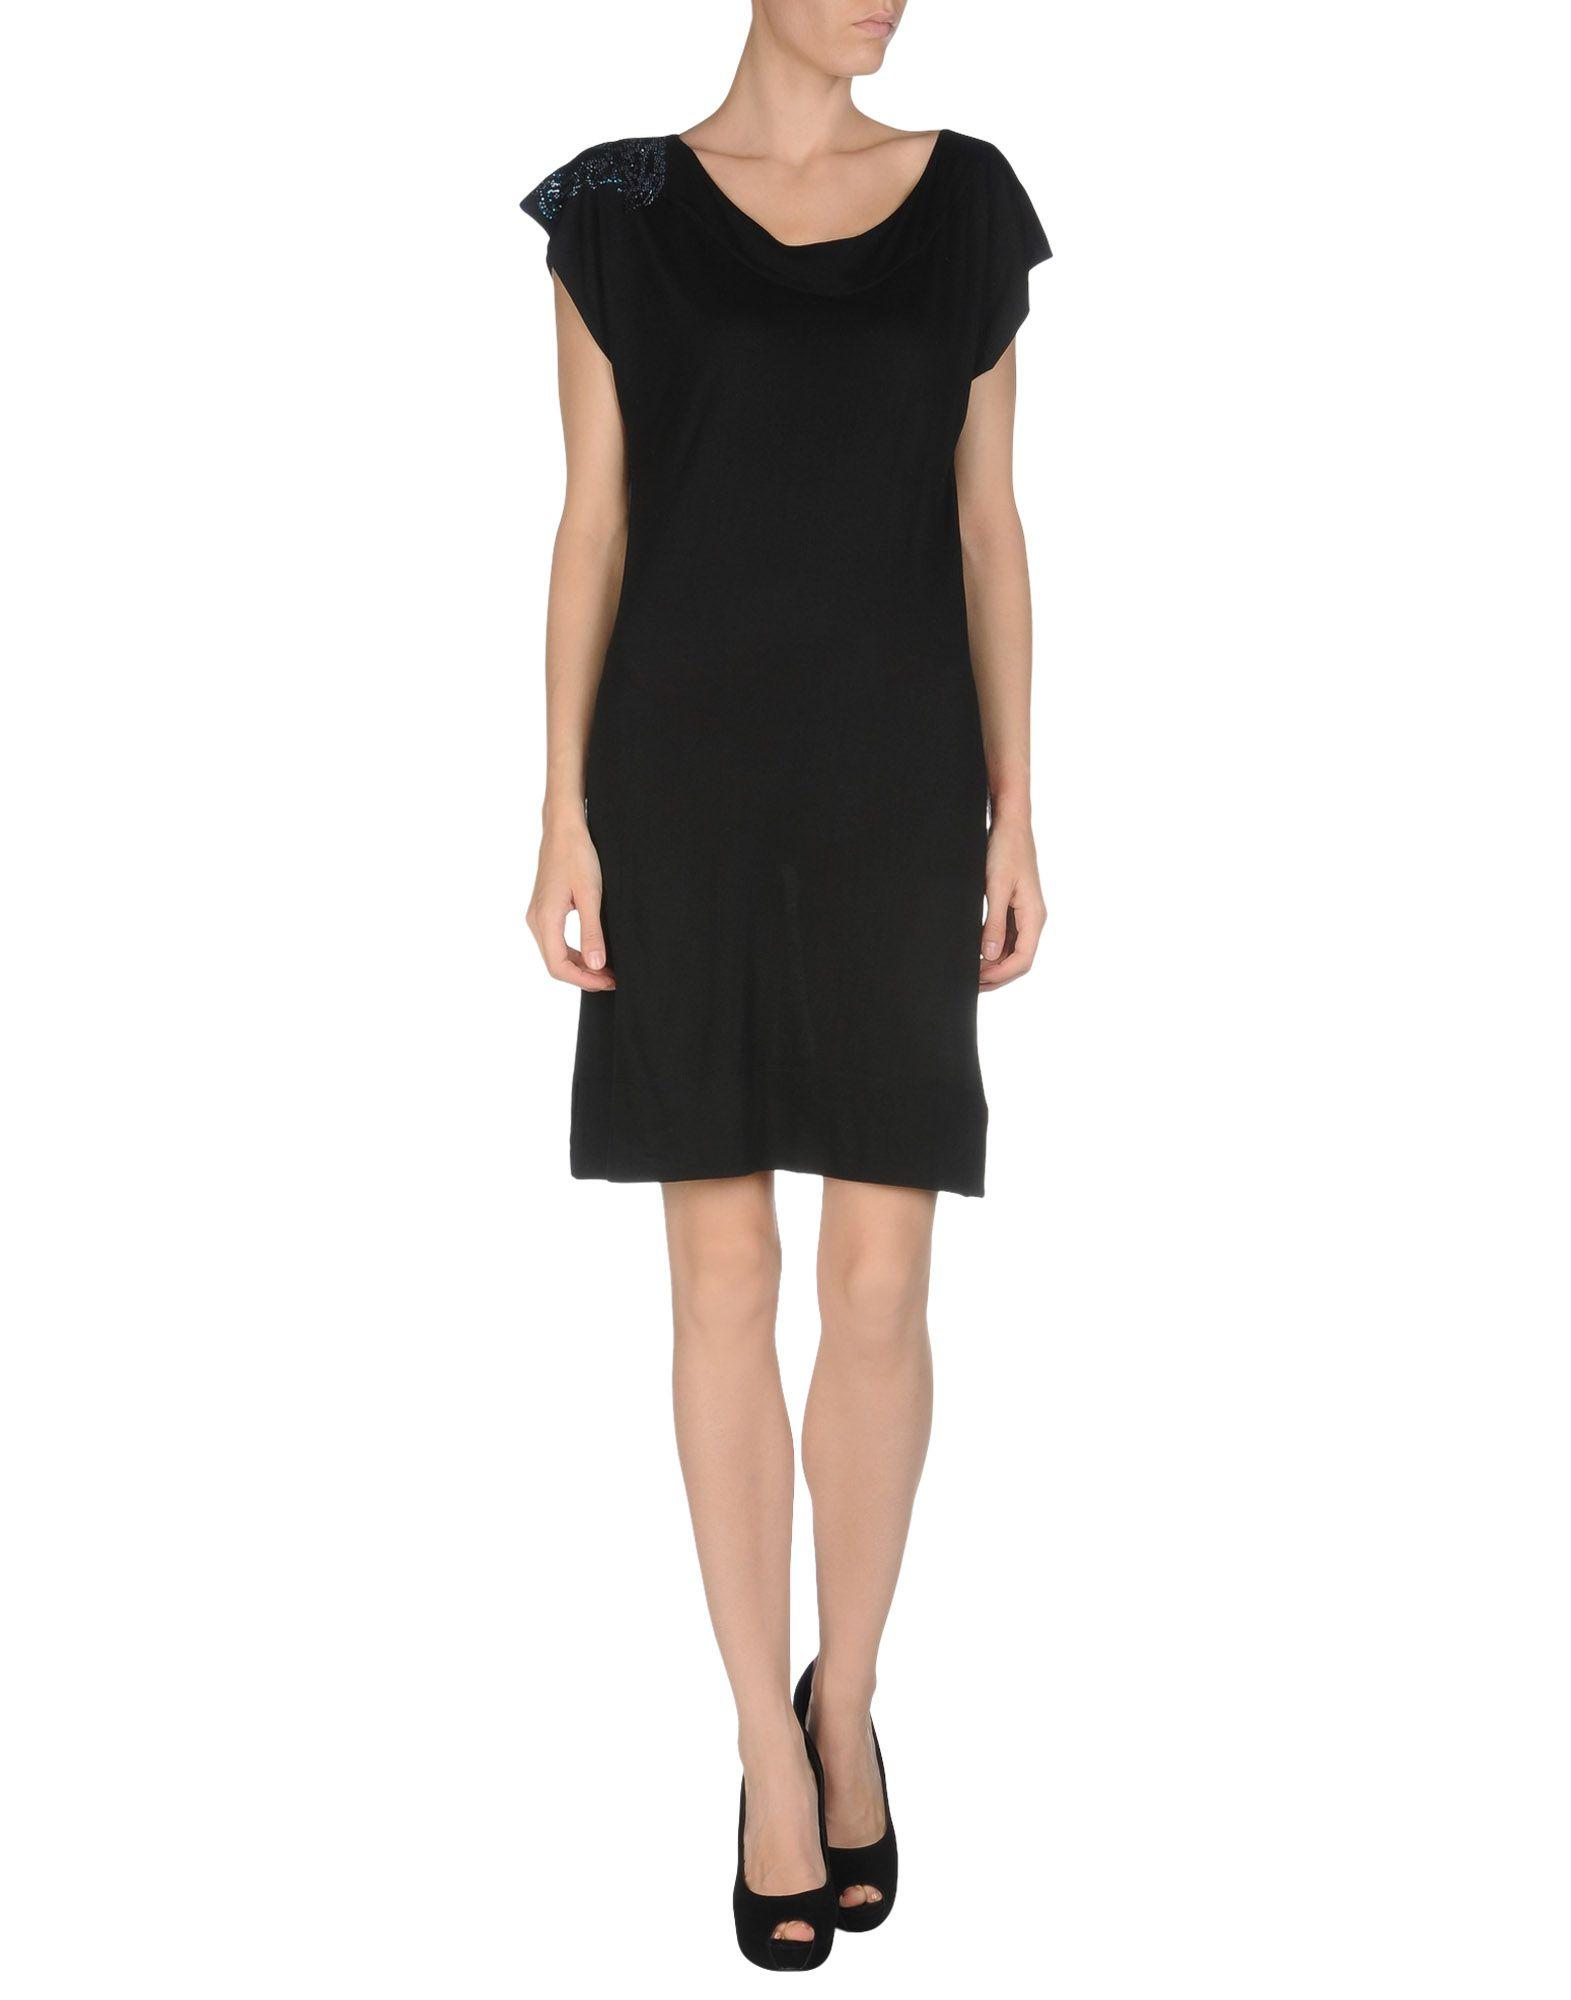 Lyst - Versace Short Dress in Black